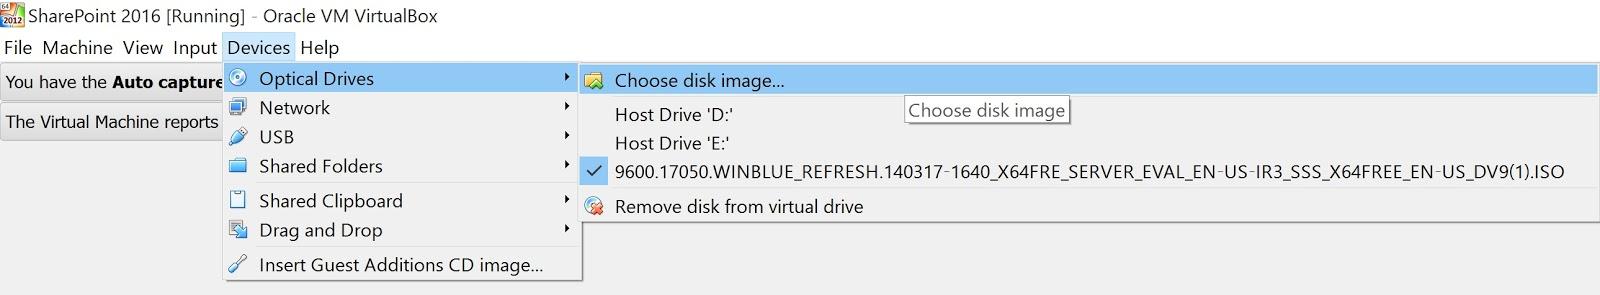 Creating Windows Server 2012 R2 VirtualBox VM for SharePoint 2016